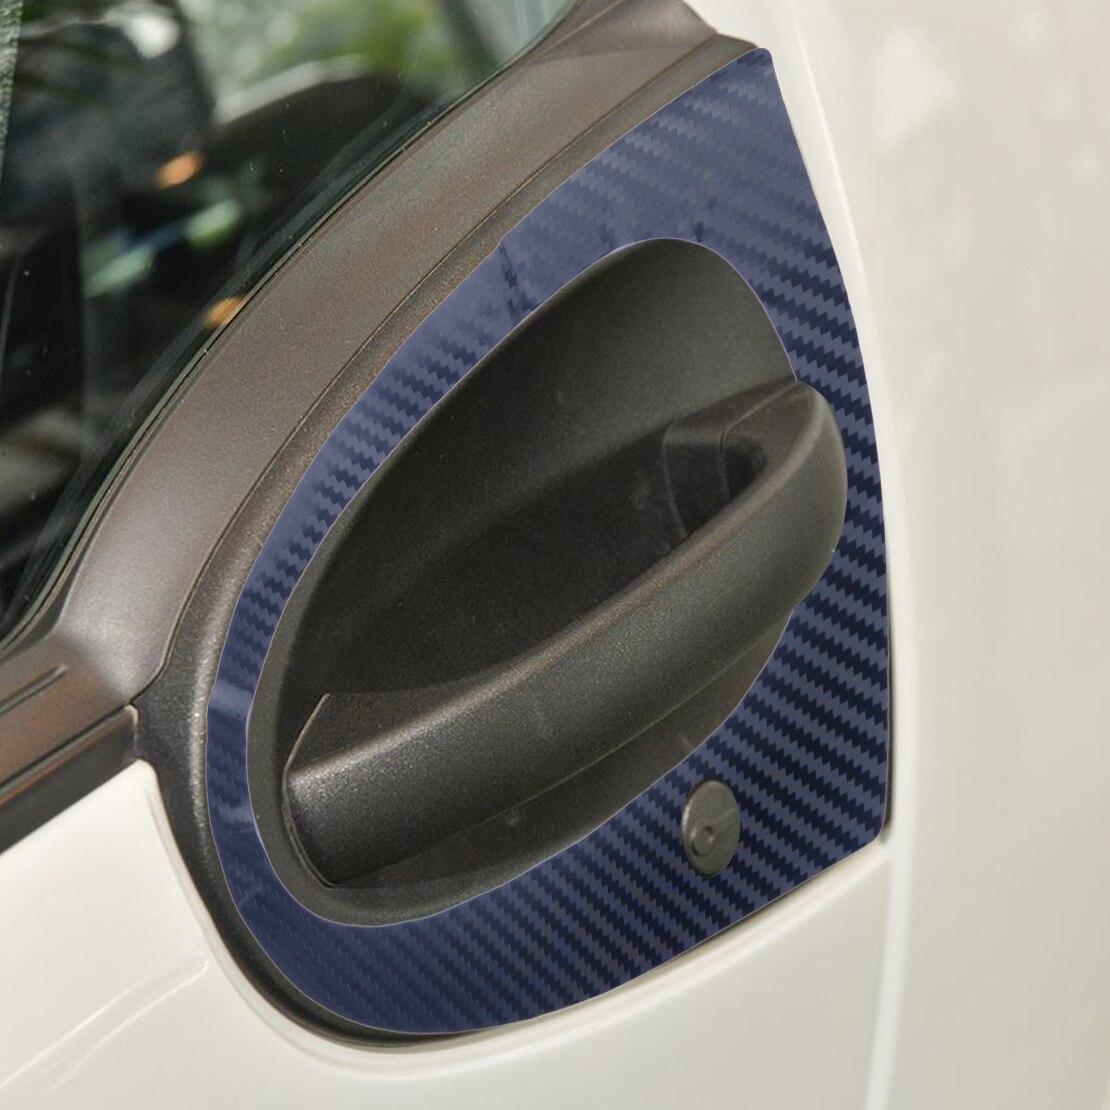 Dwcx 2pcs Pet Car Door Handle 3d Sticker Cover Trim Fit For Smart 451 Fuse Box Citall Fortwo Brabus